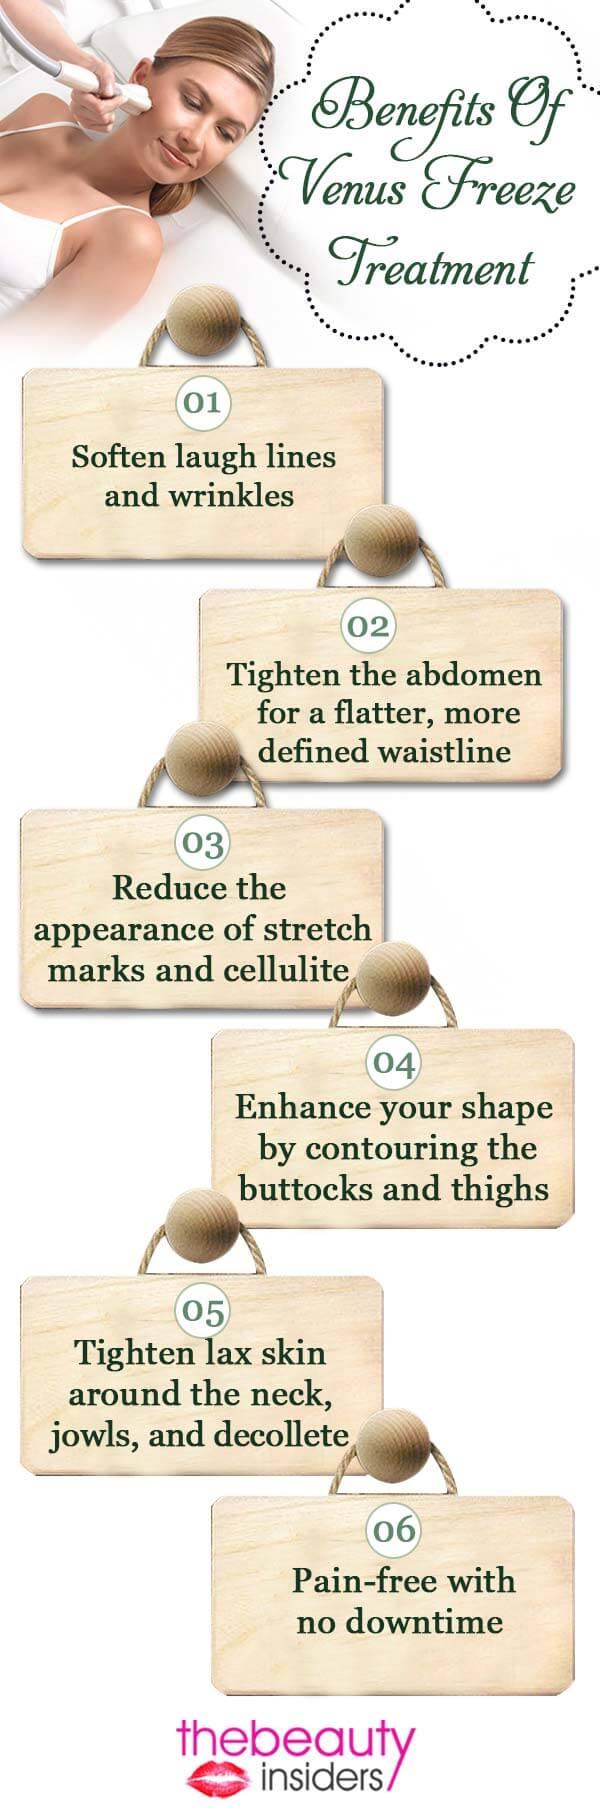 Benefits Of Venus Freeze Treatment